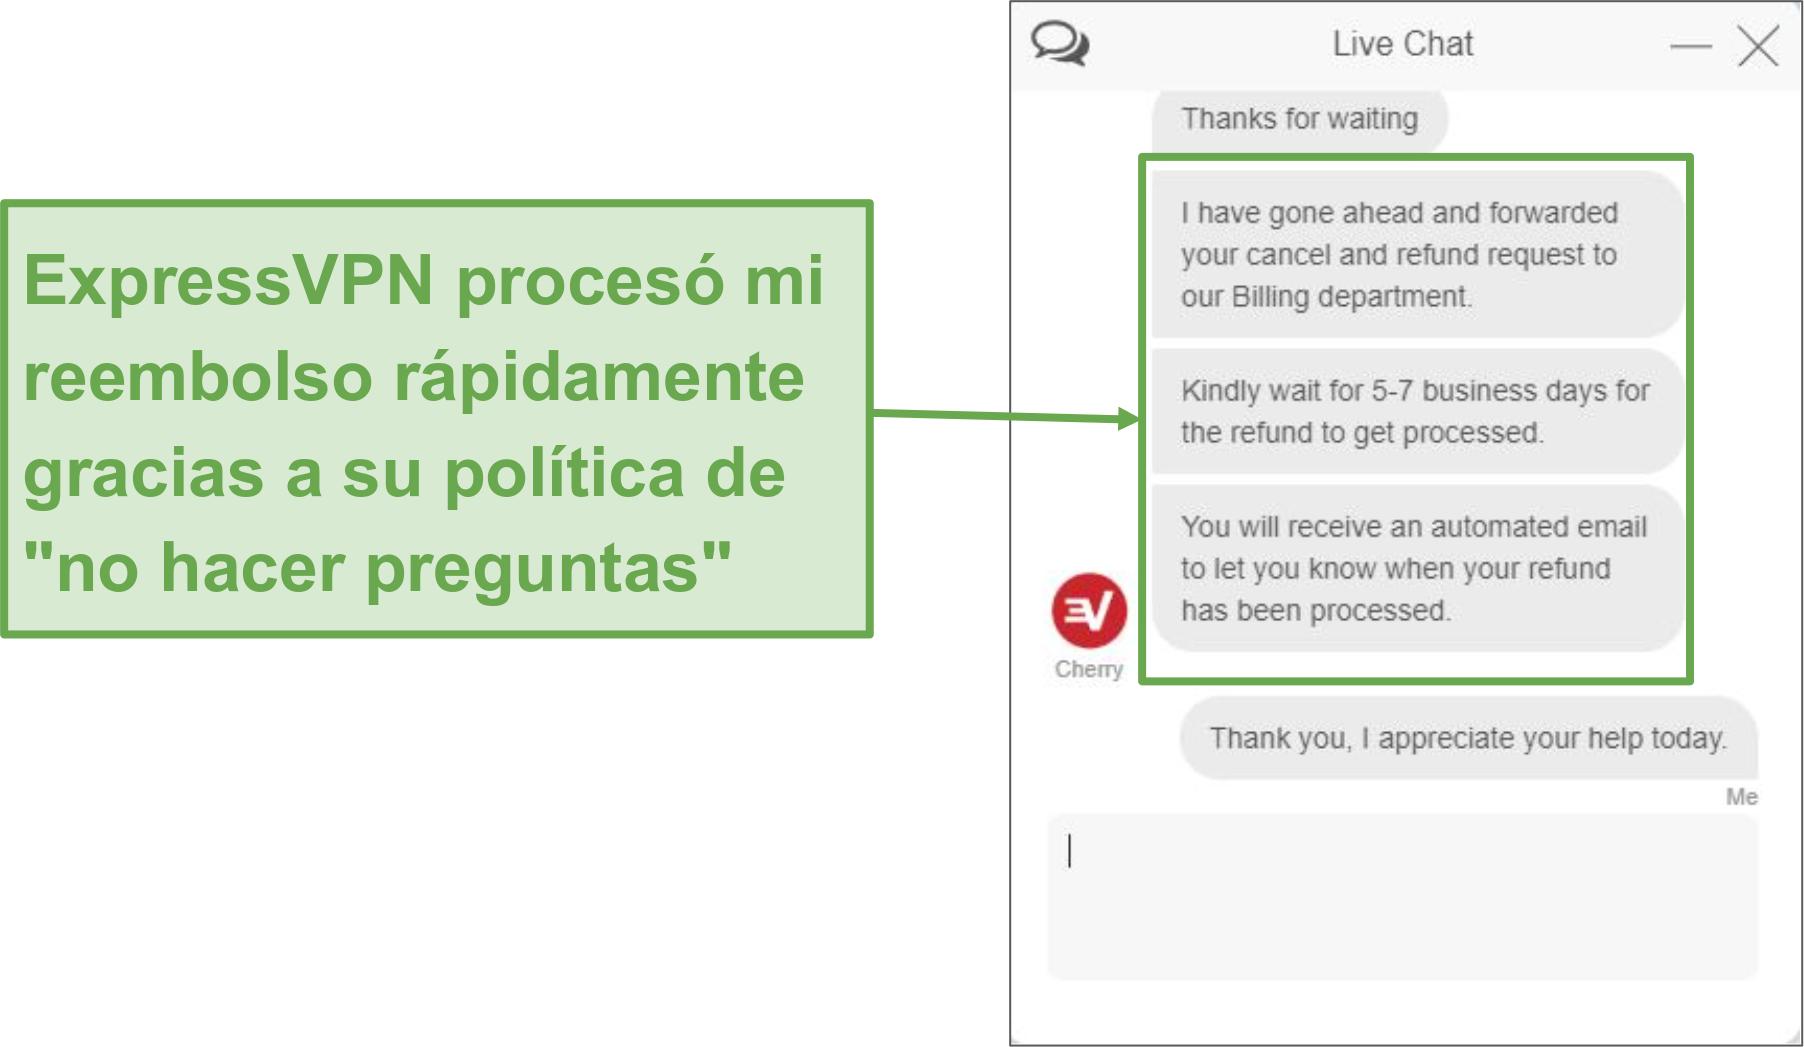 Captura de pantalla de la solicitud de reembolso a través del chat en vivo.